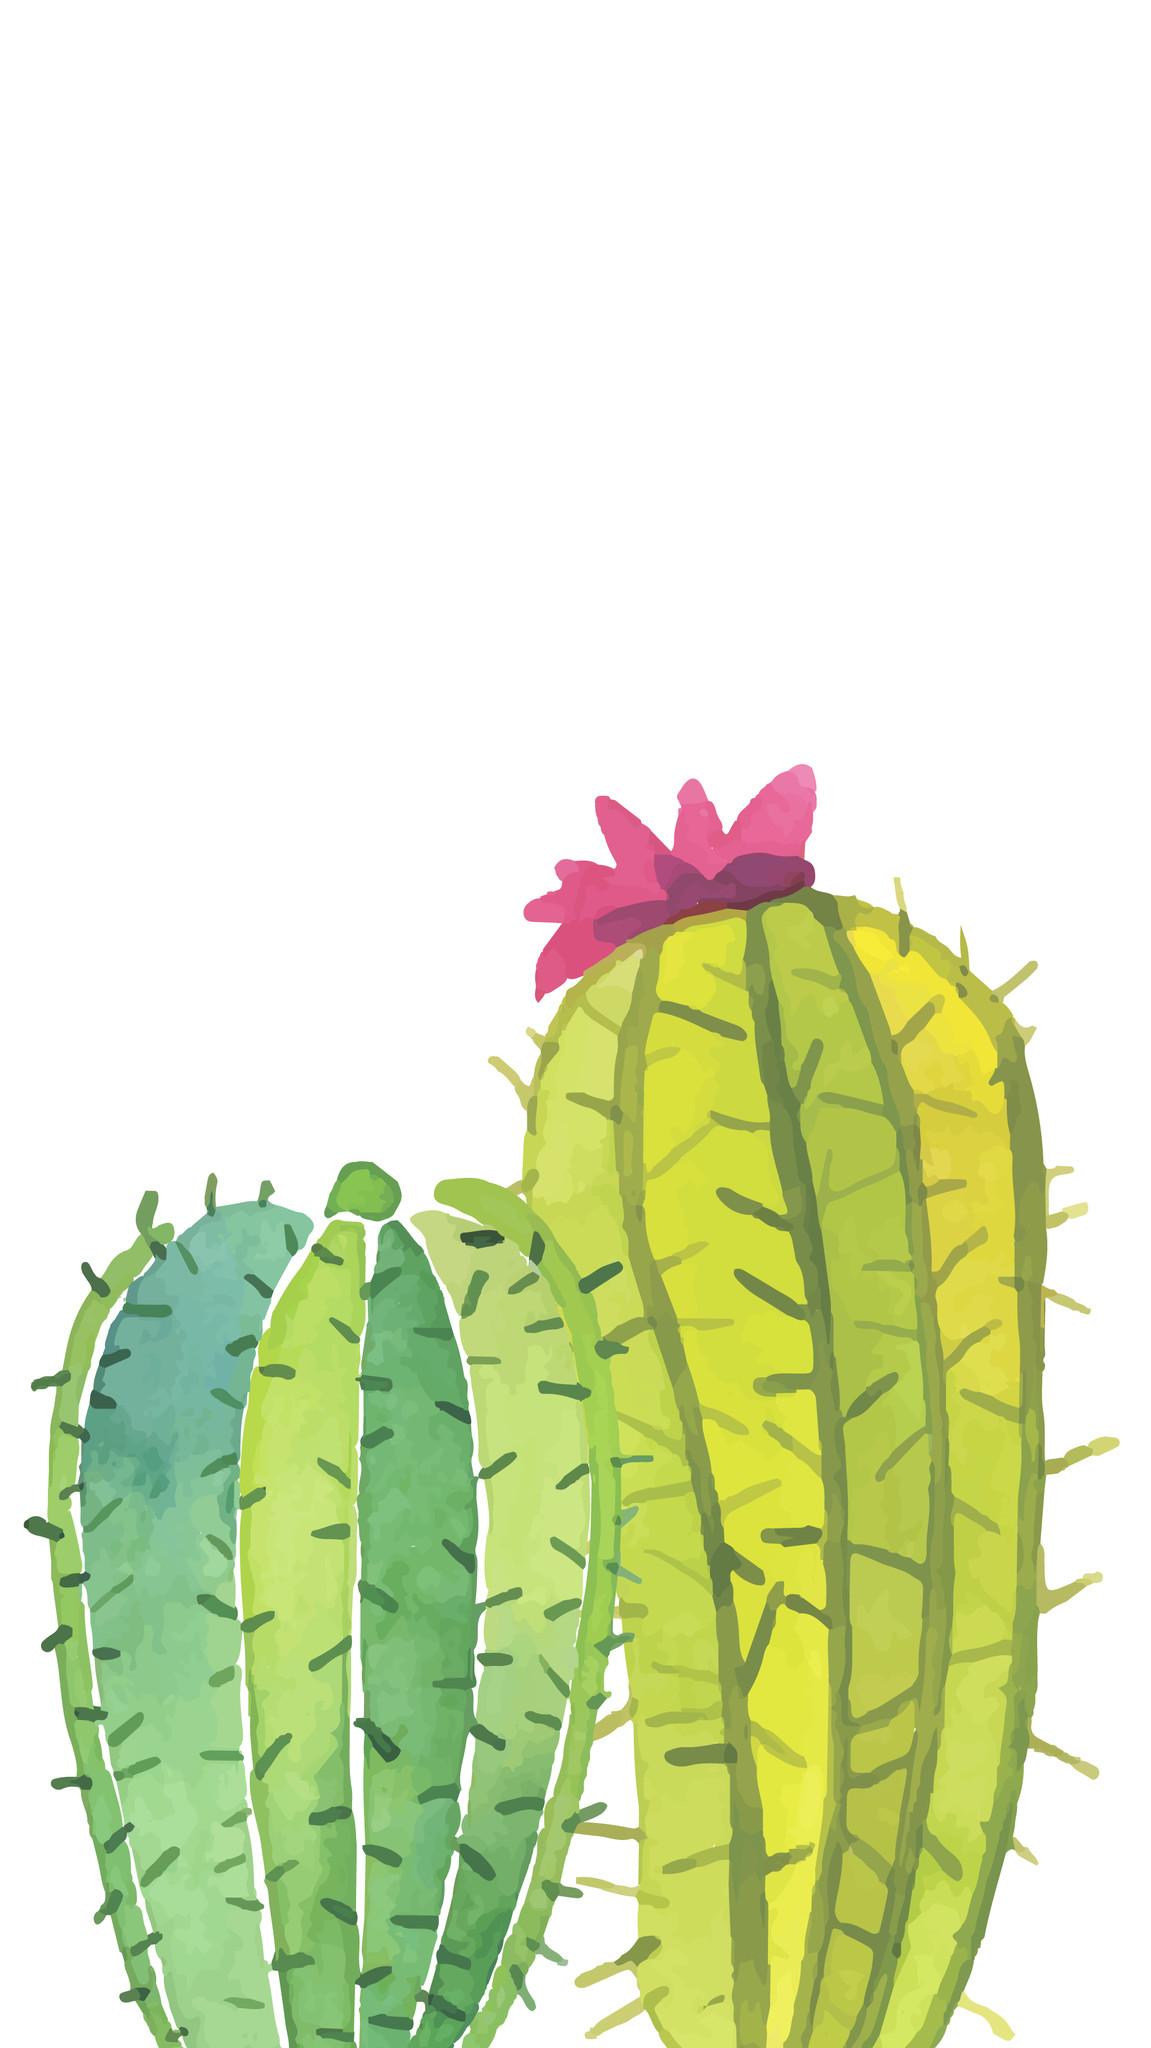 Cactus Wallpaper 52 Images